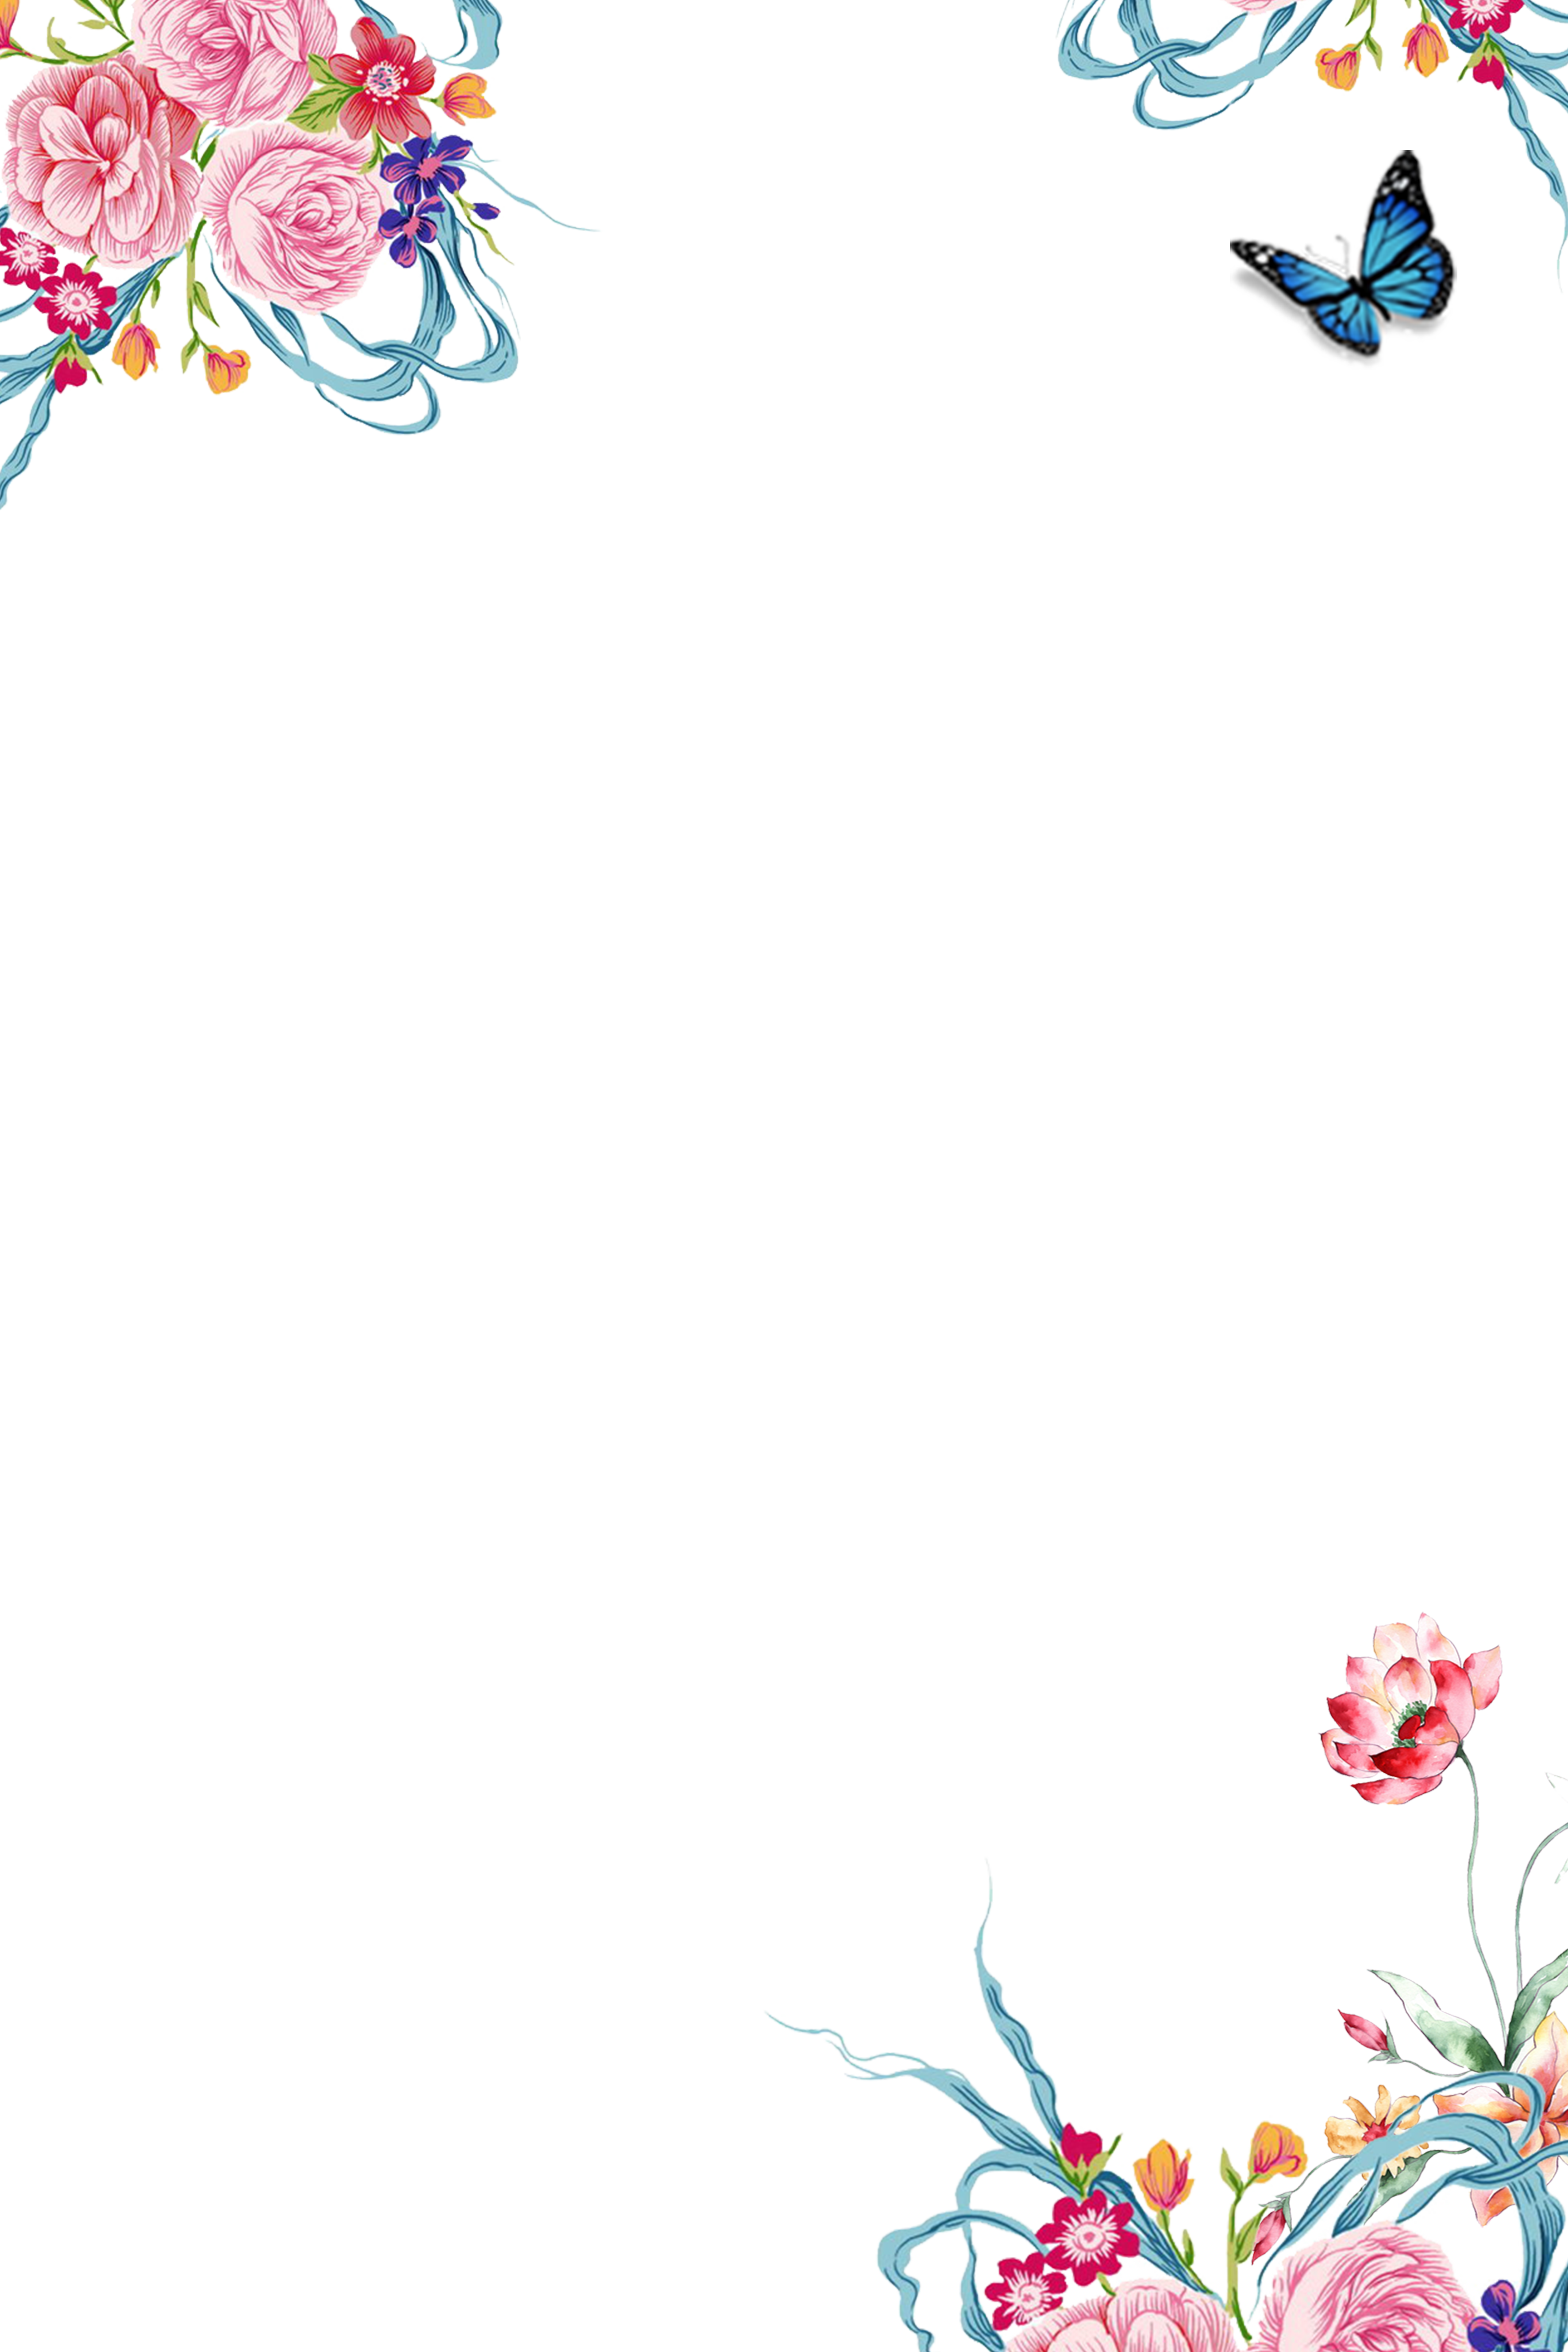 Summer flower border clipart image black and white stock Clip art - Summer borders of flowers 3543*5315 transprent Png Free ... image black and white stock